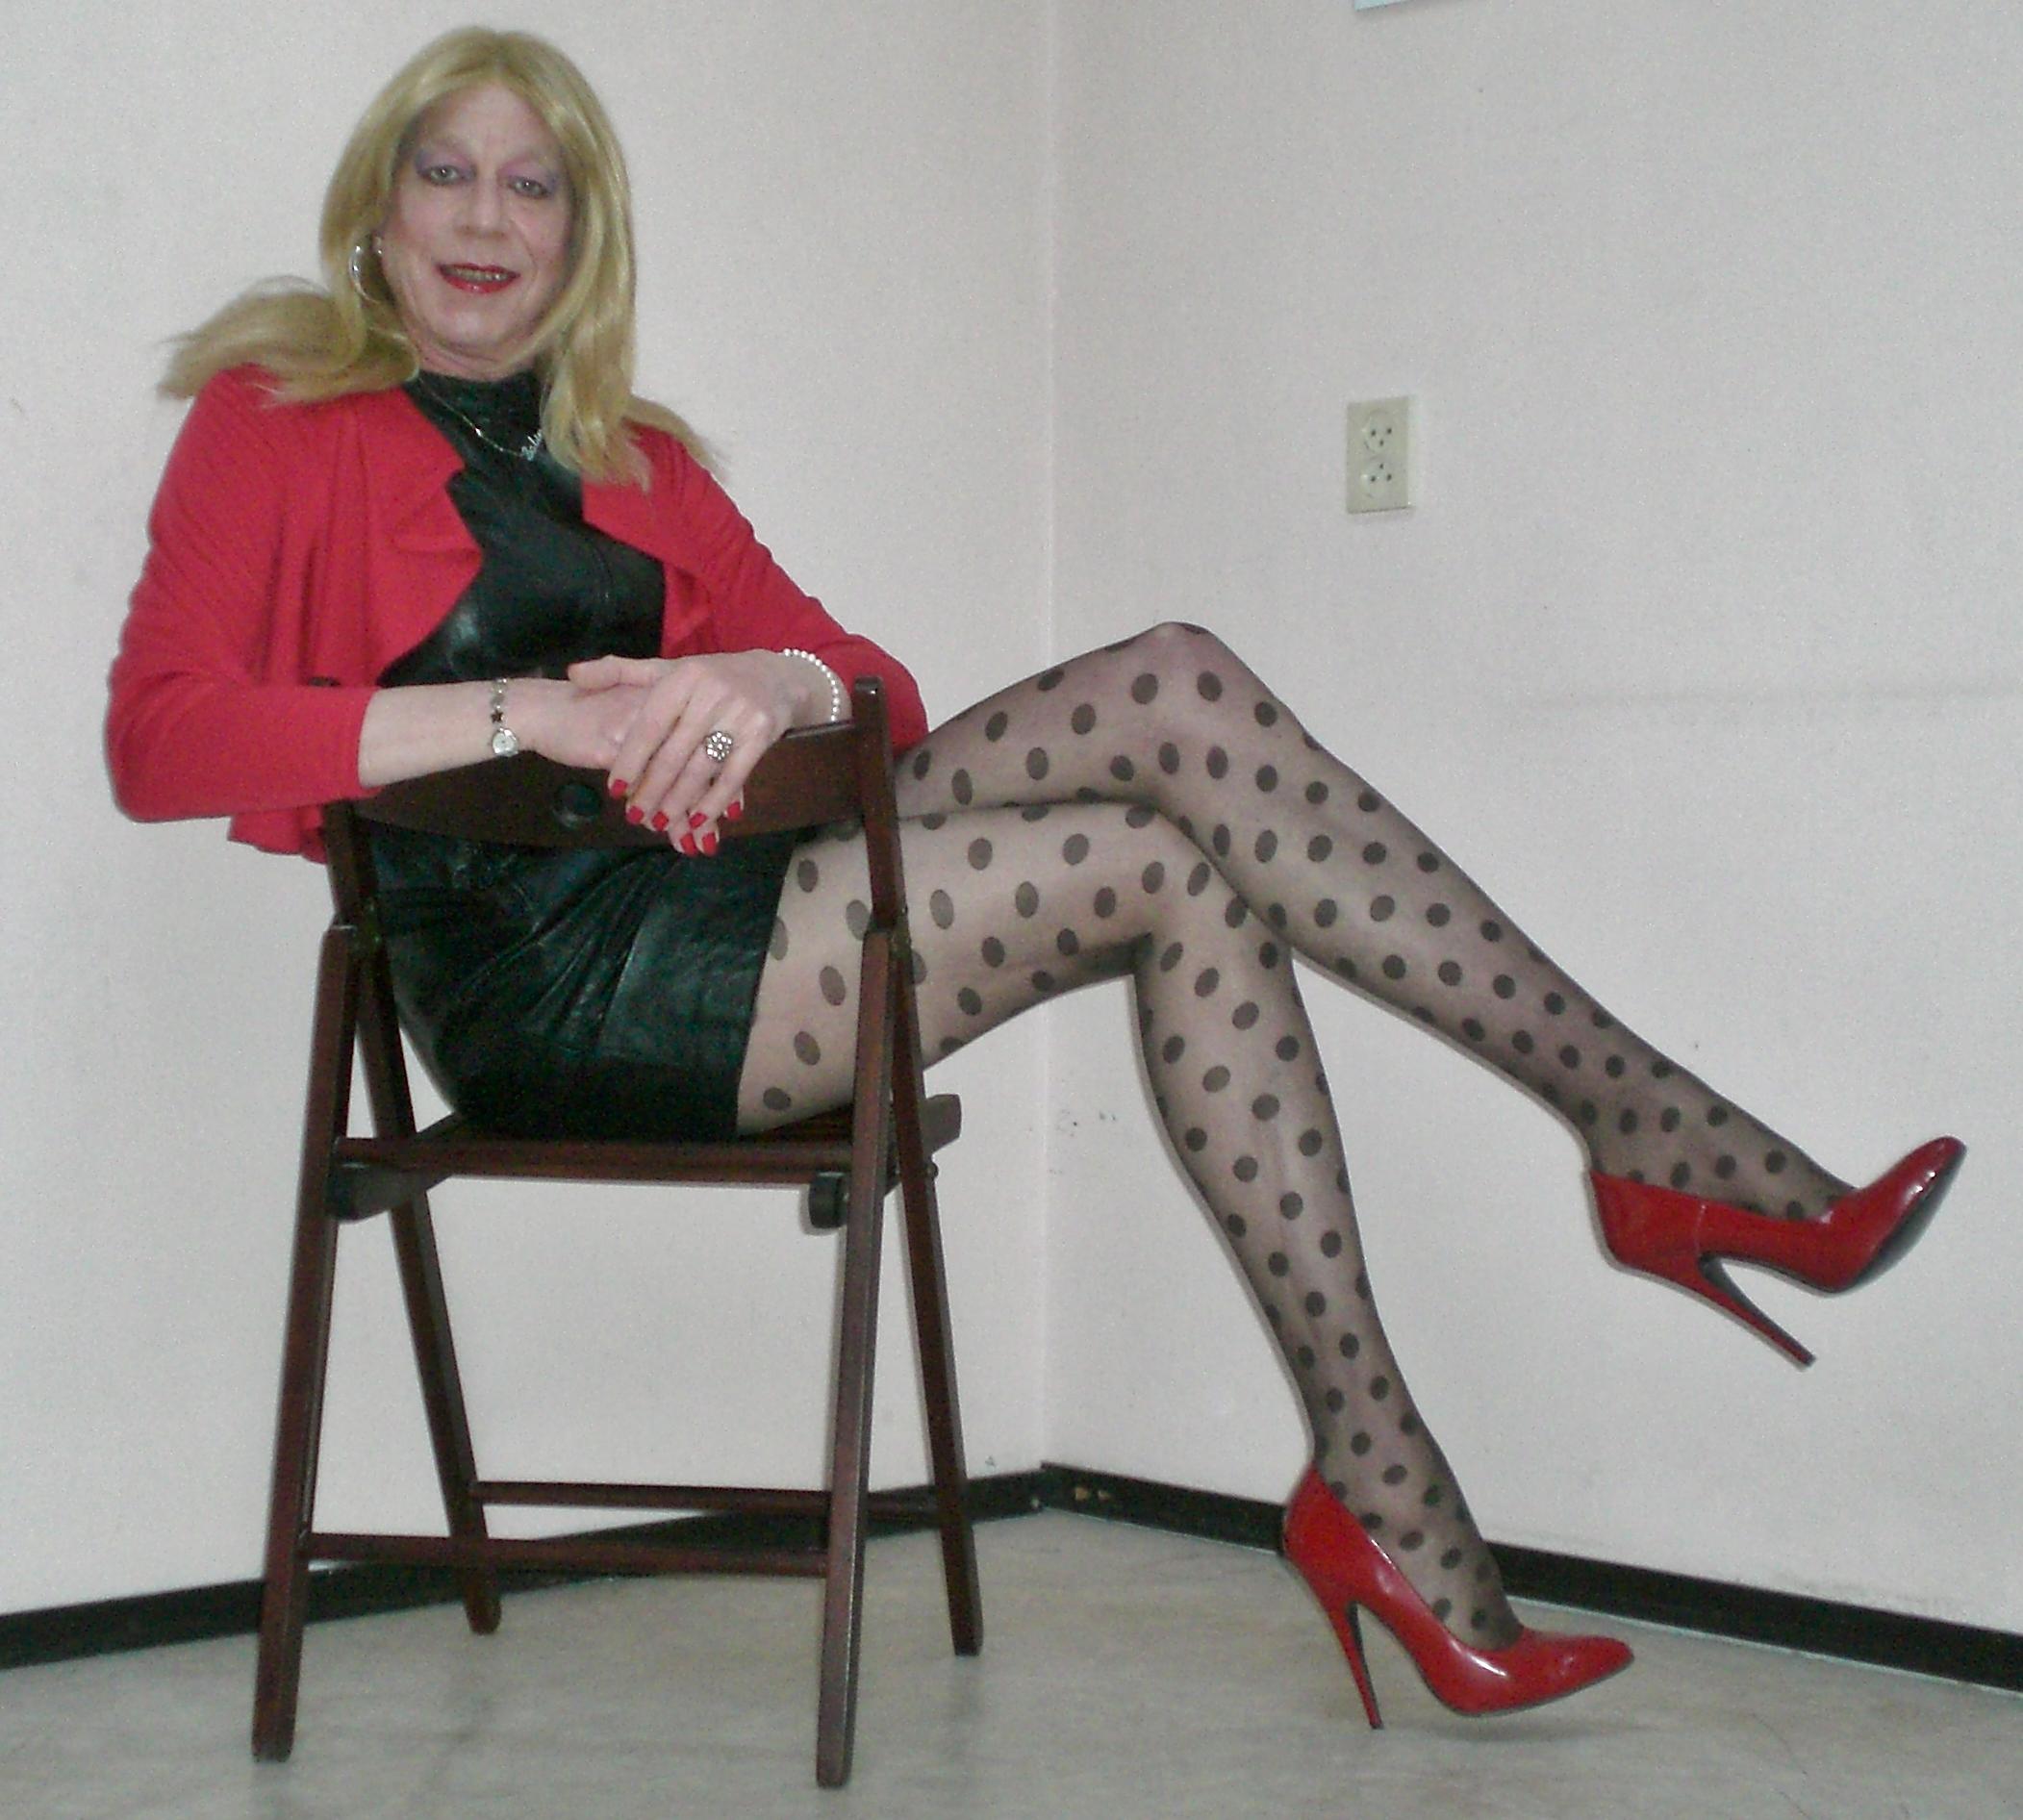 Crossdressing high heels Crossdresser High